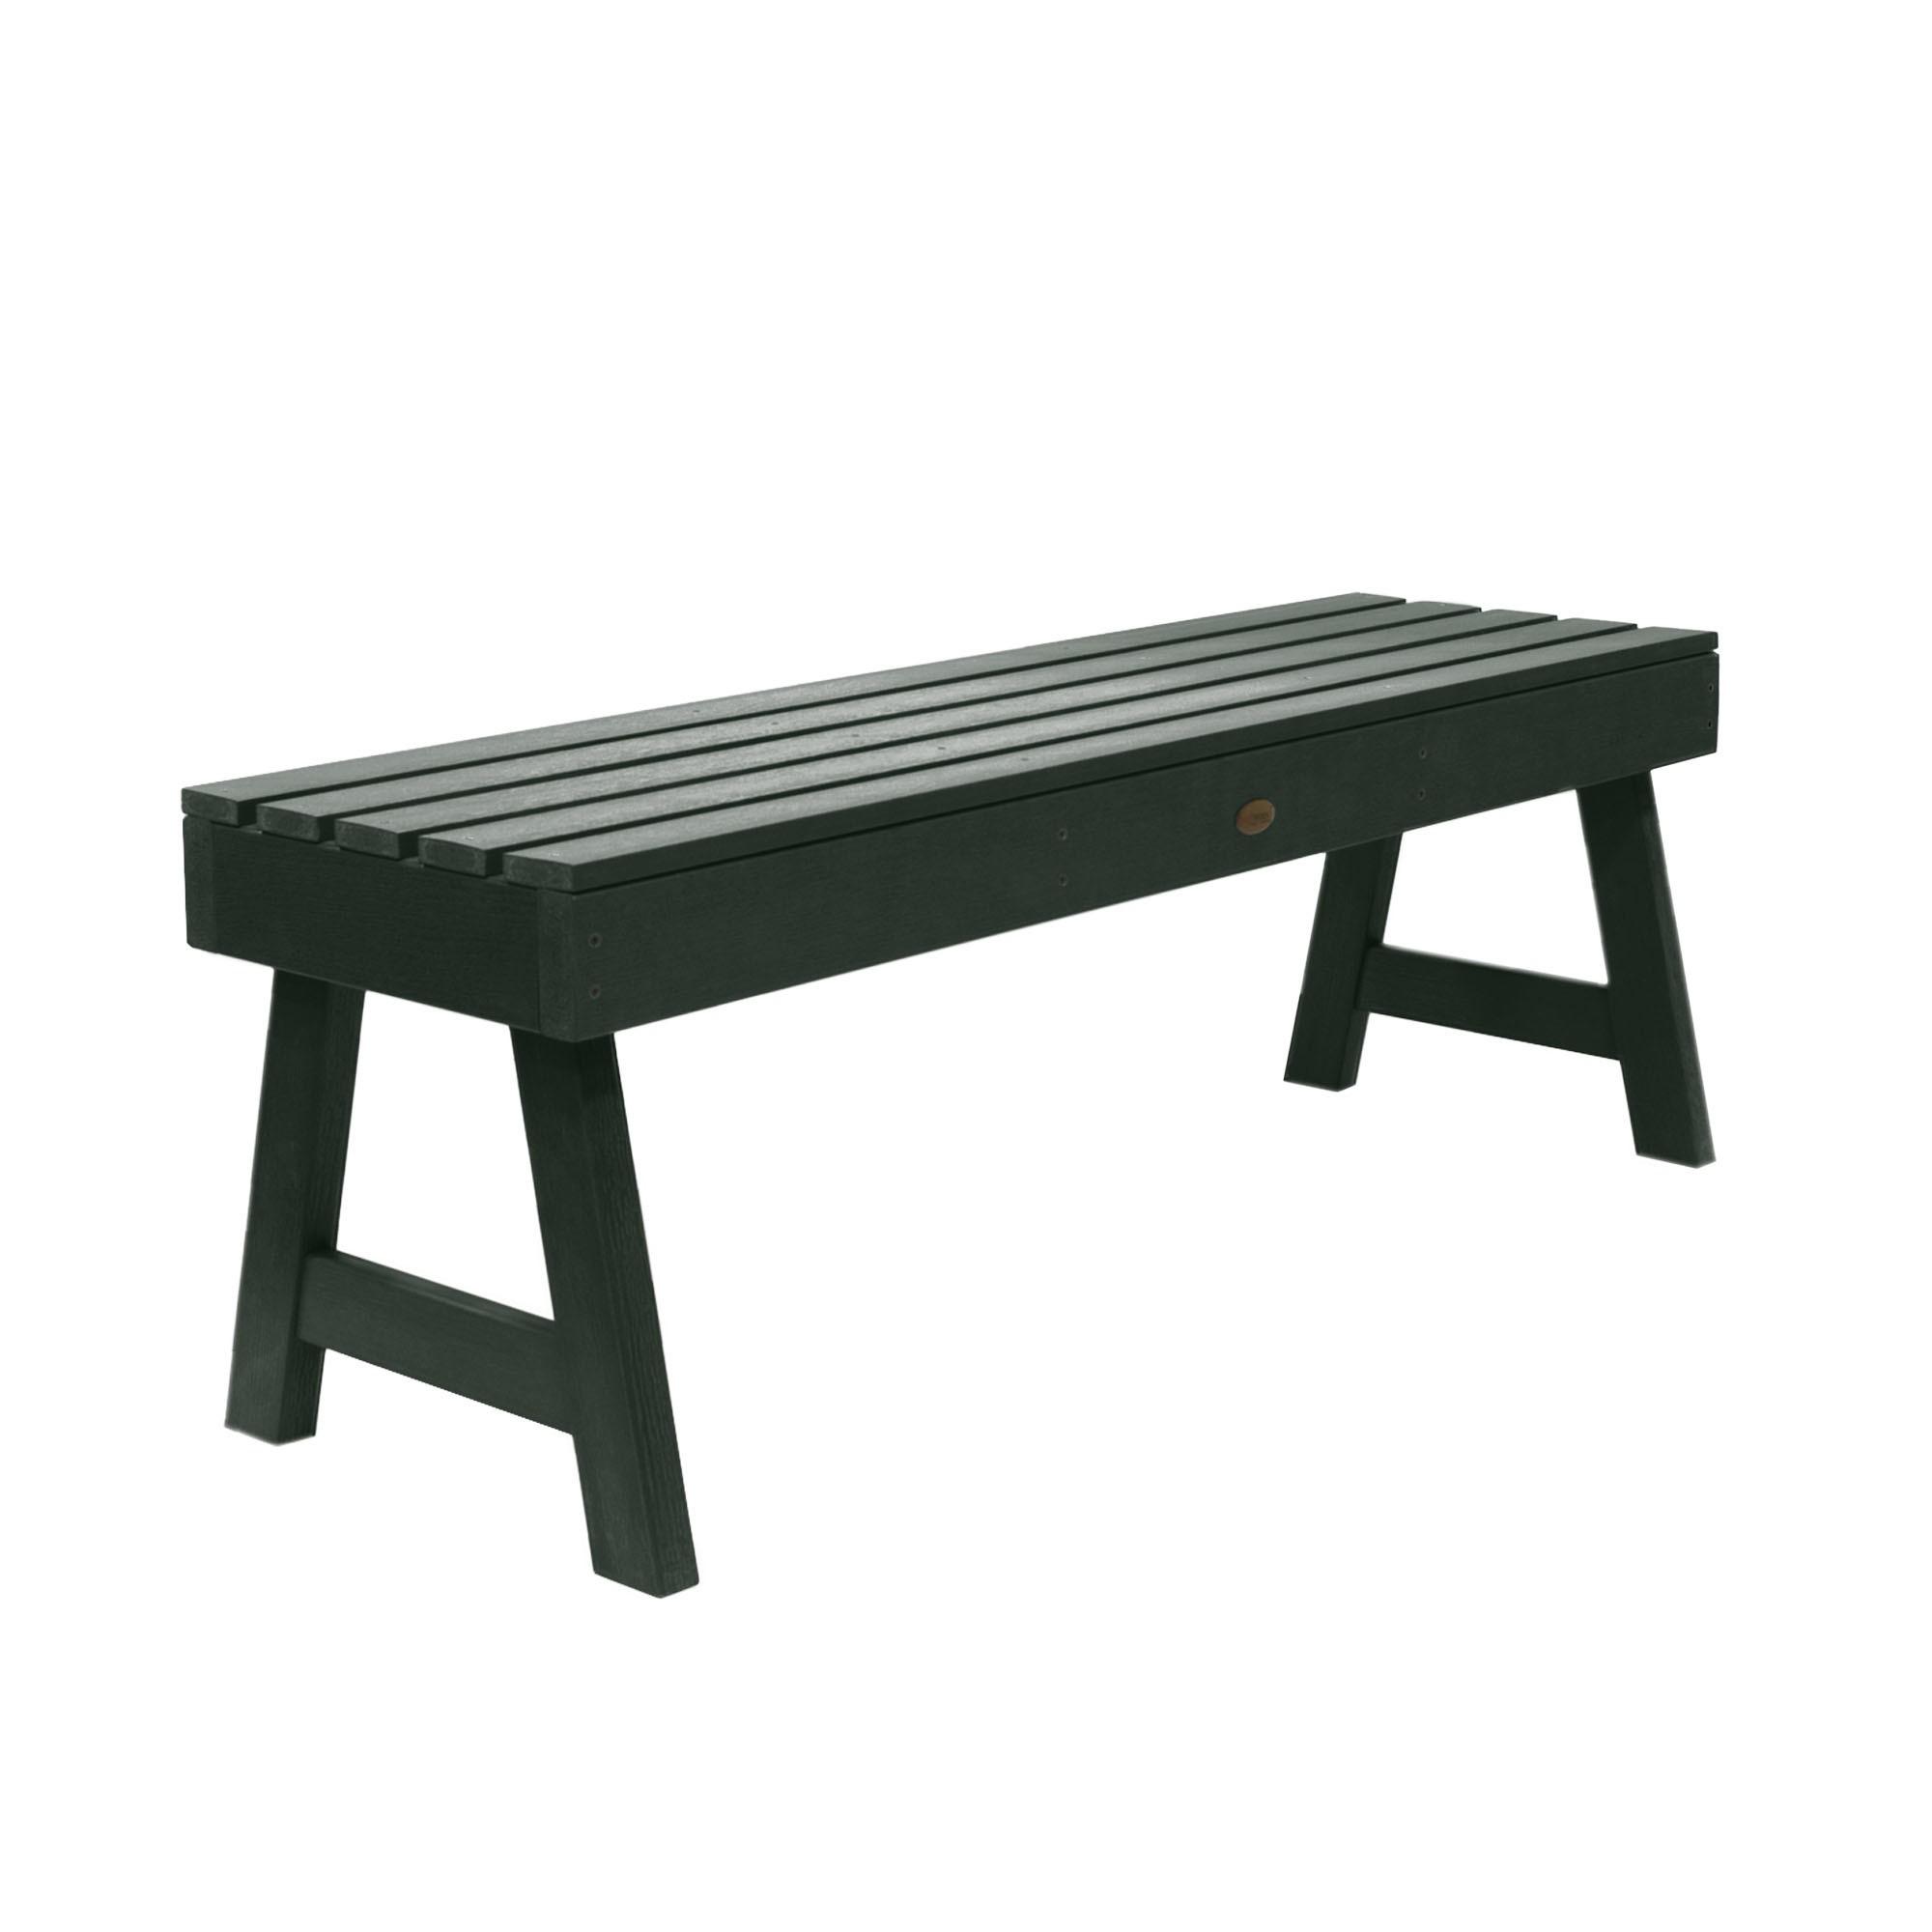 Weatherly Picnic Bench 4ft Charleston Green - Highwood